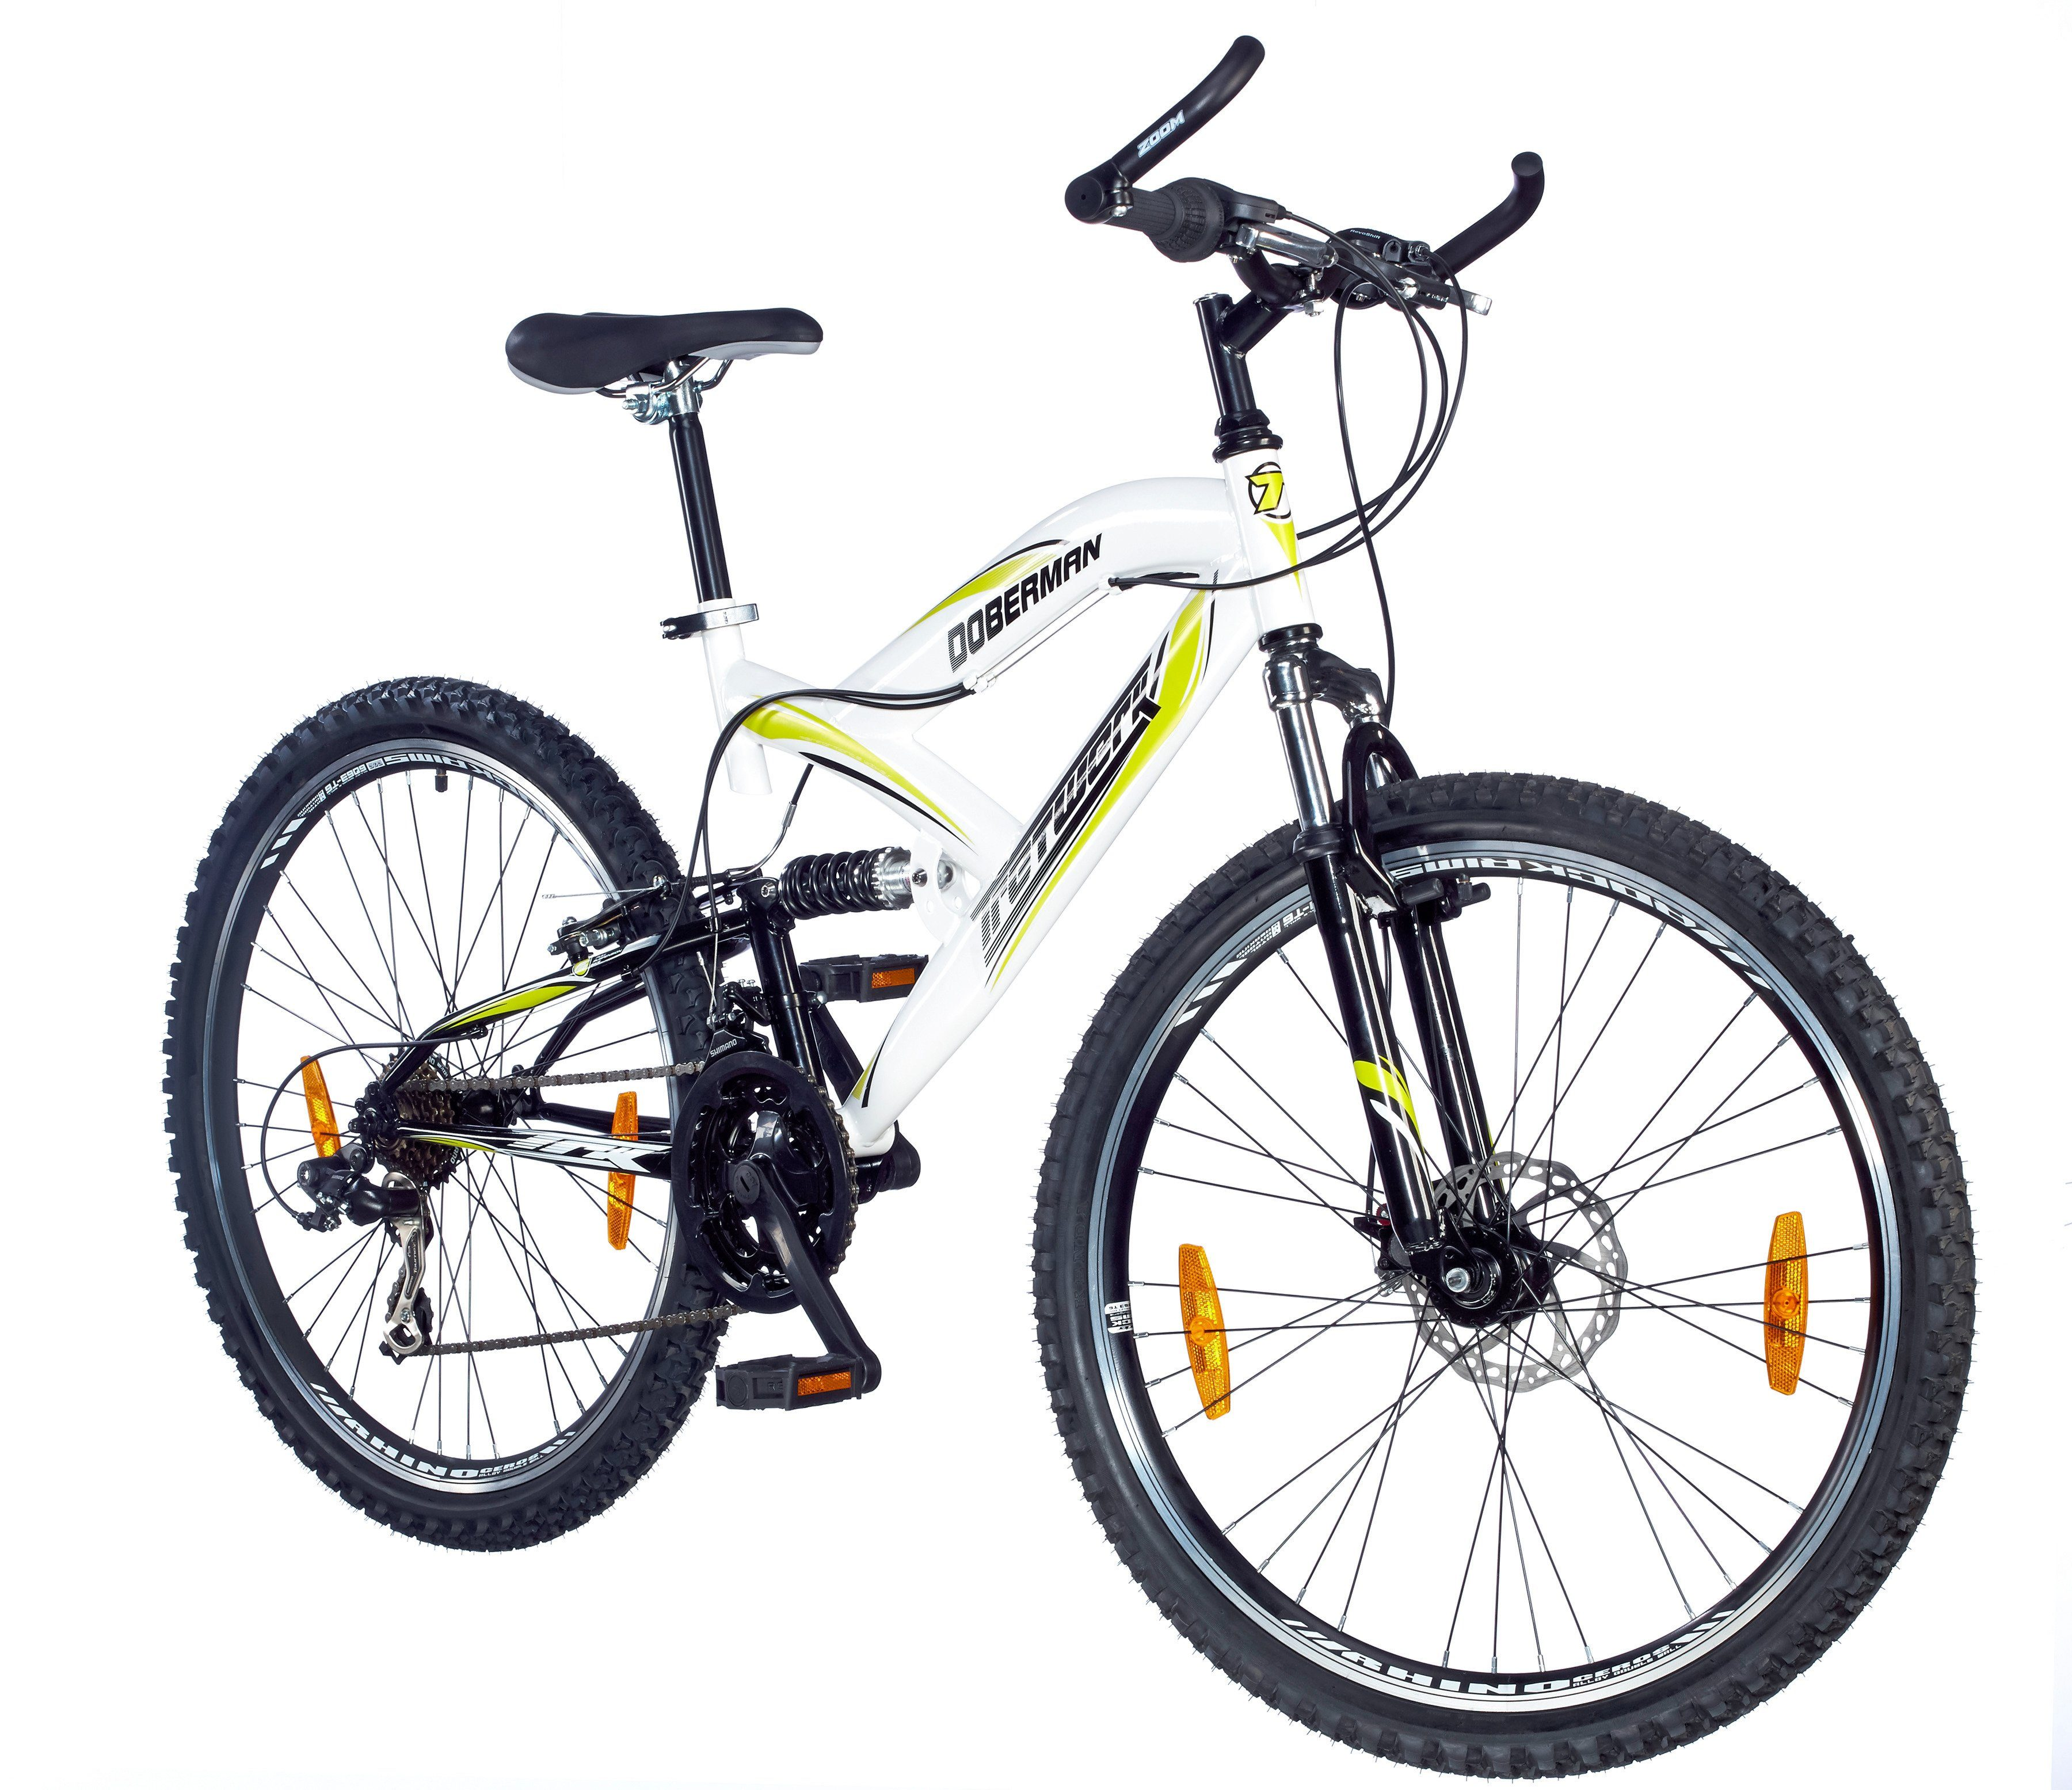 Onux Mountainbike »66,04 cm (26 Zoll)«